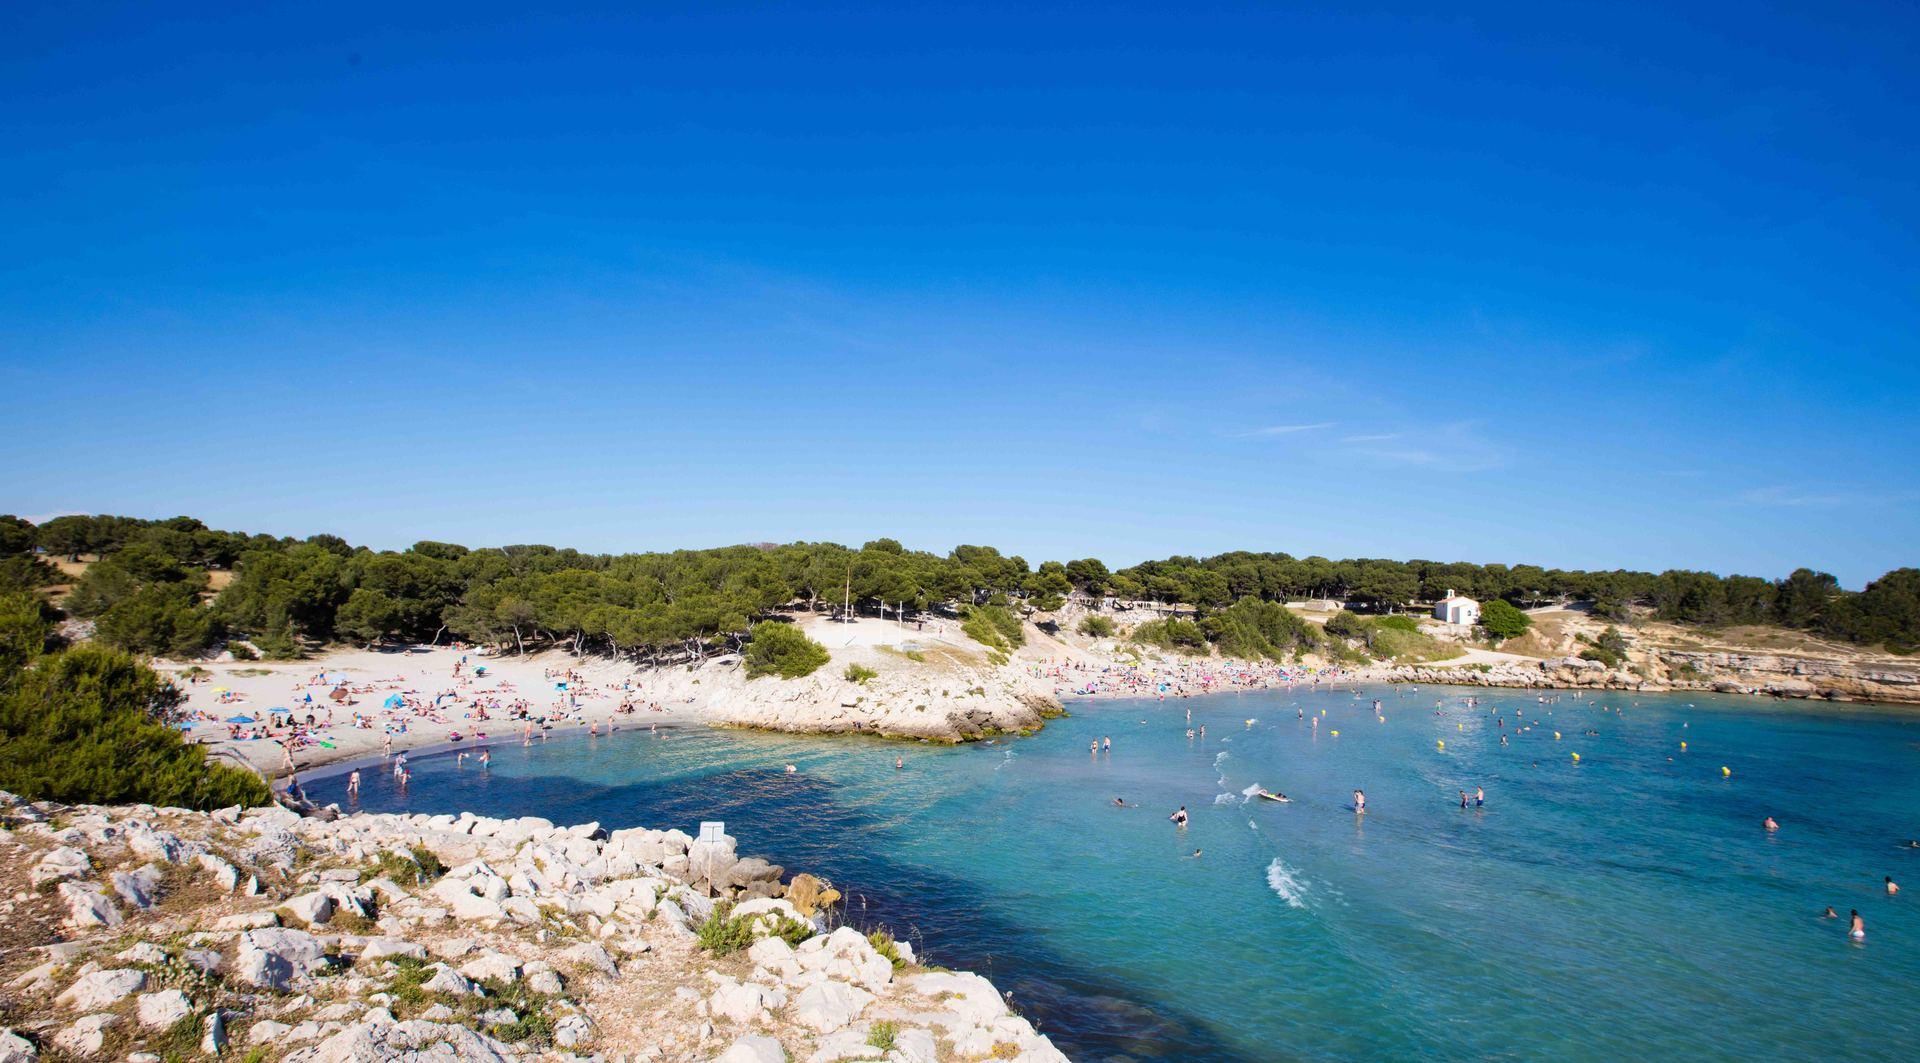 Frankrijk-La%20Couronne-Camping%20Pascalounet-ExtraLarge Wintersport Frankrijk|Pagina 4 van 55